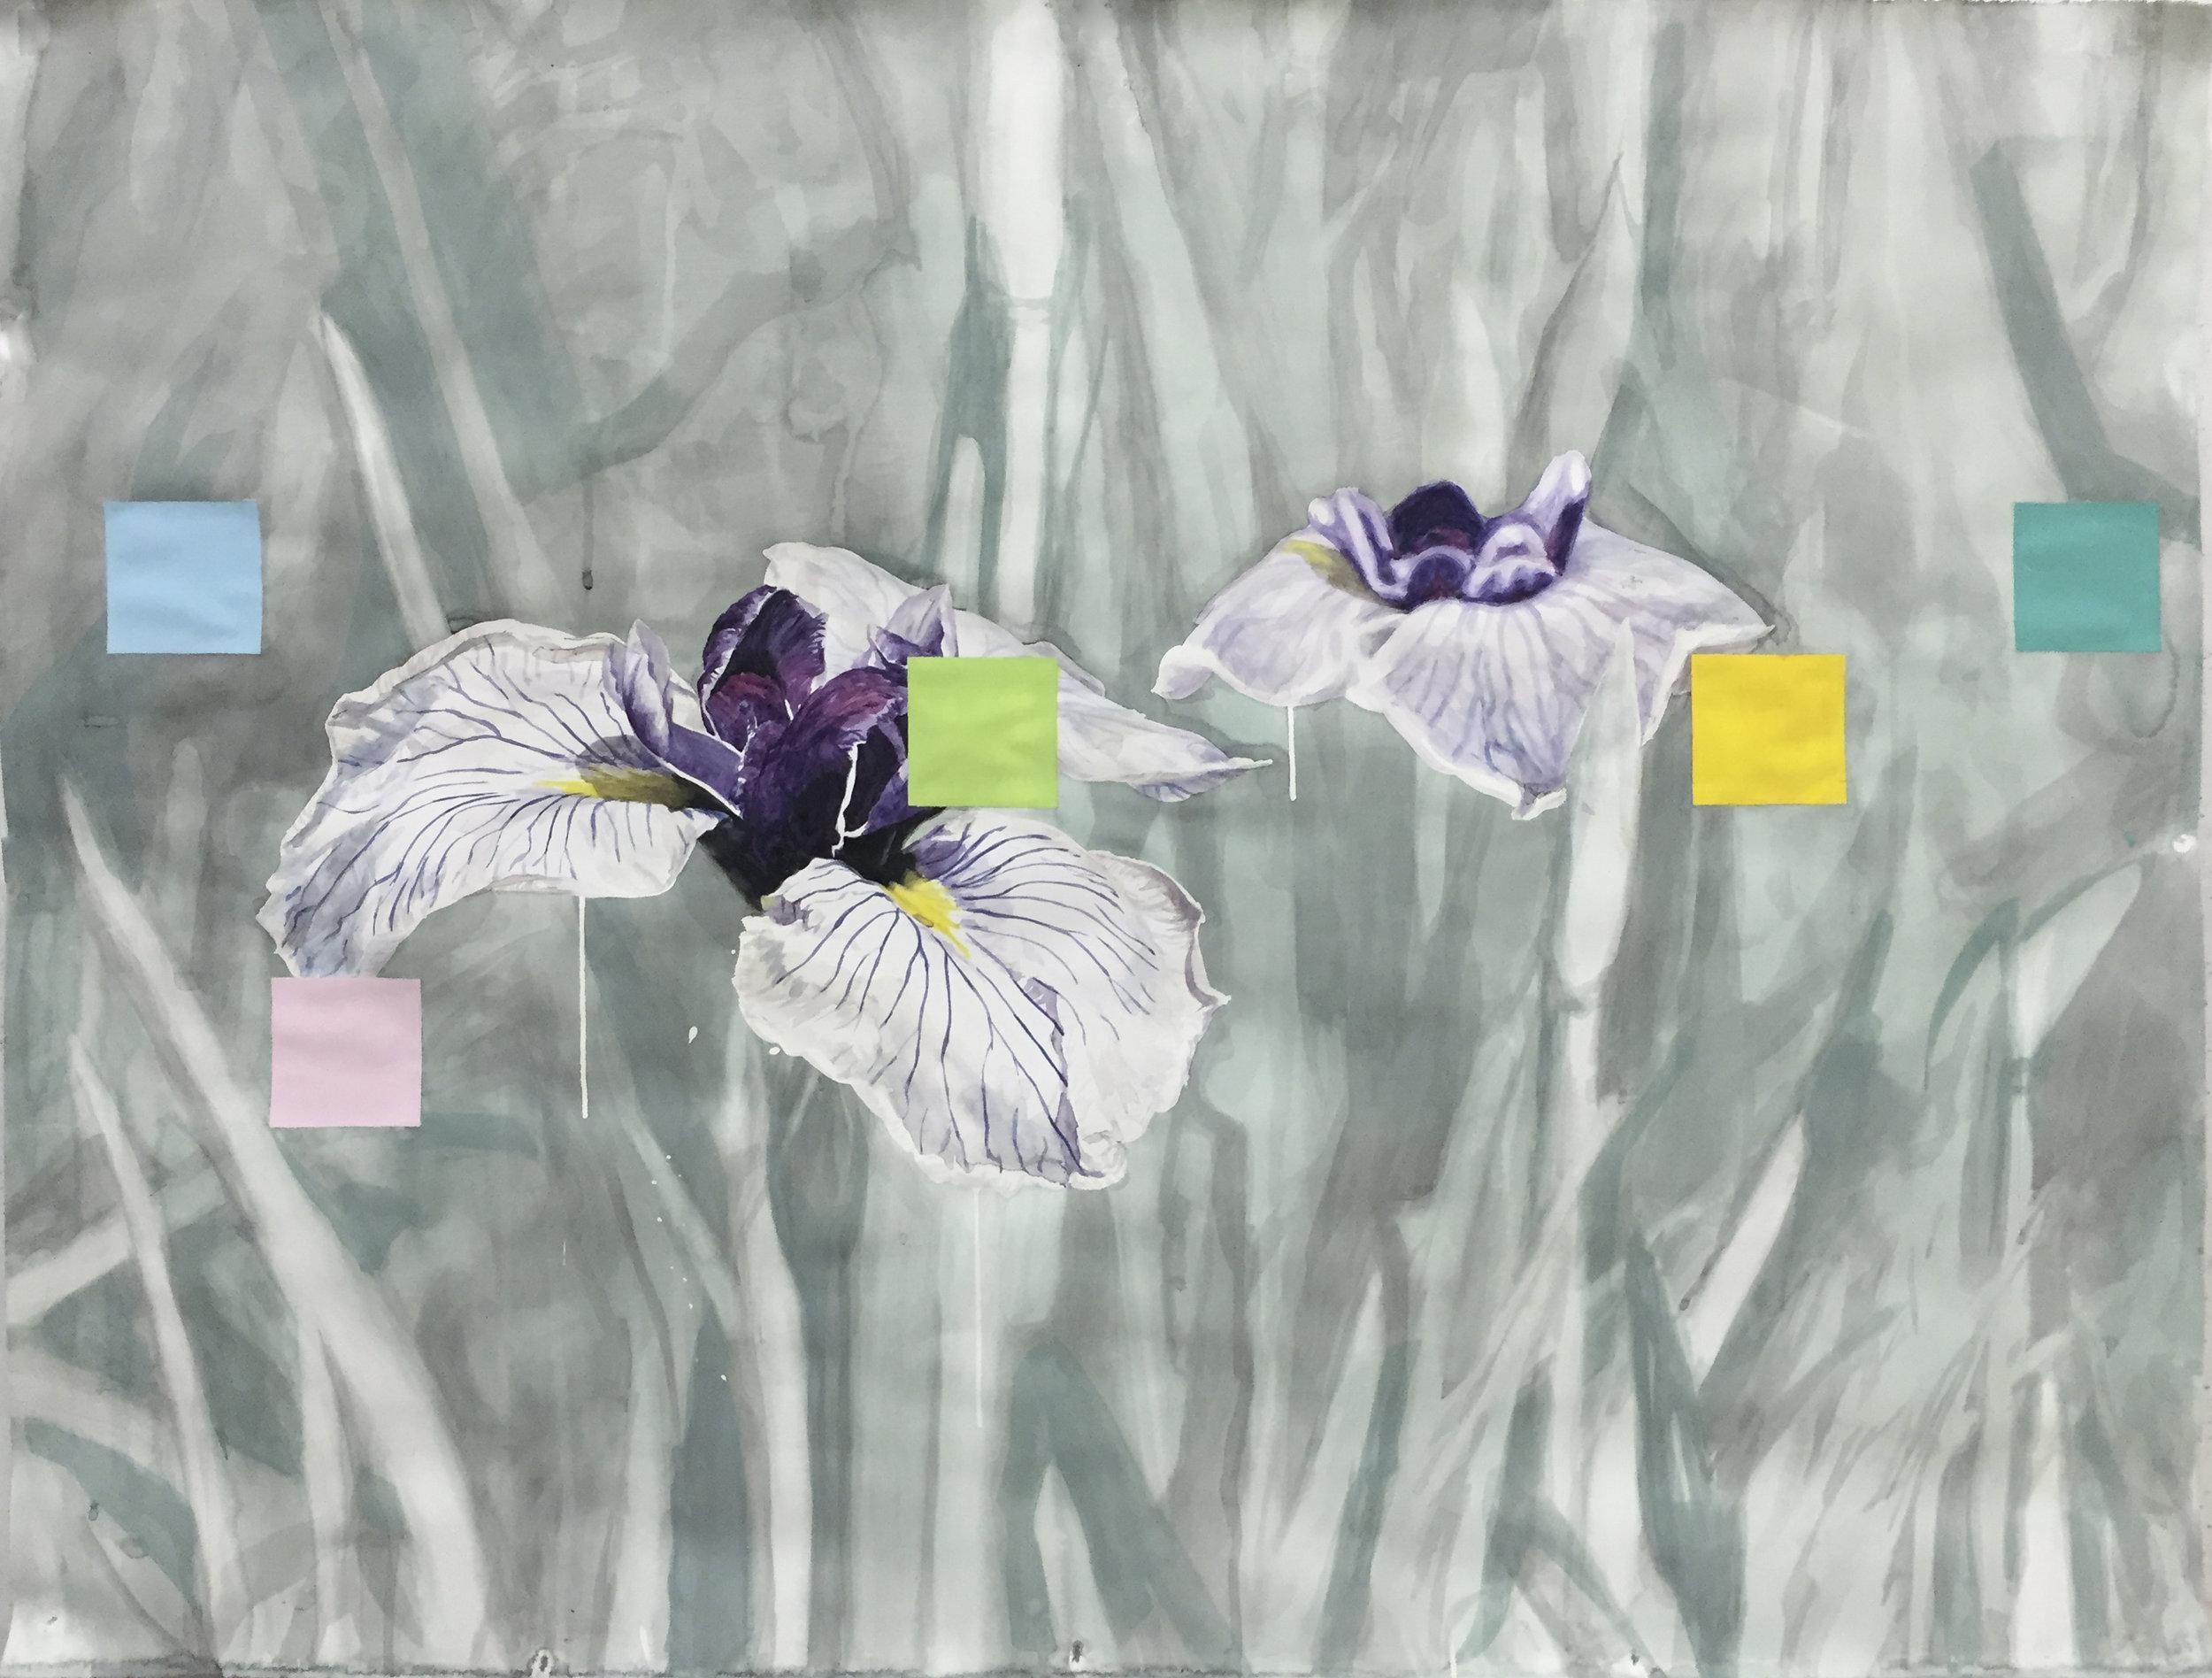 Double Negative (Irises)